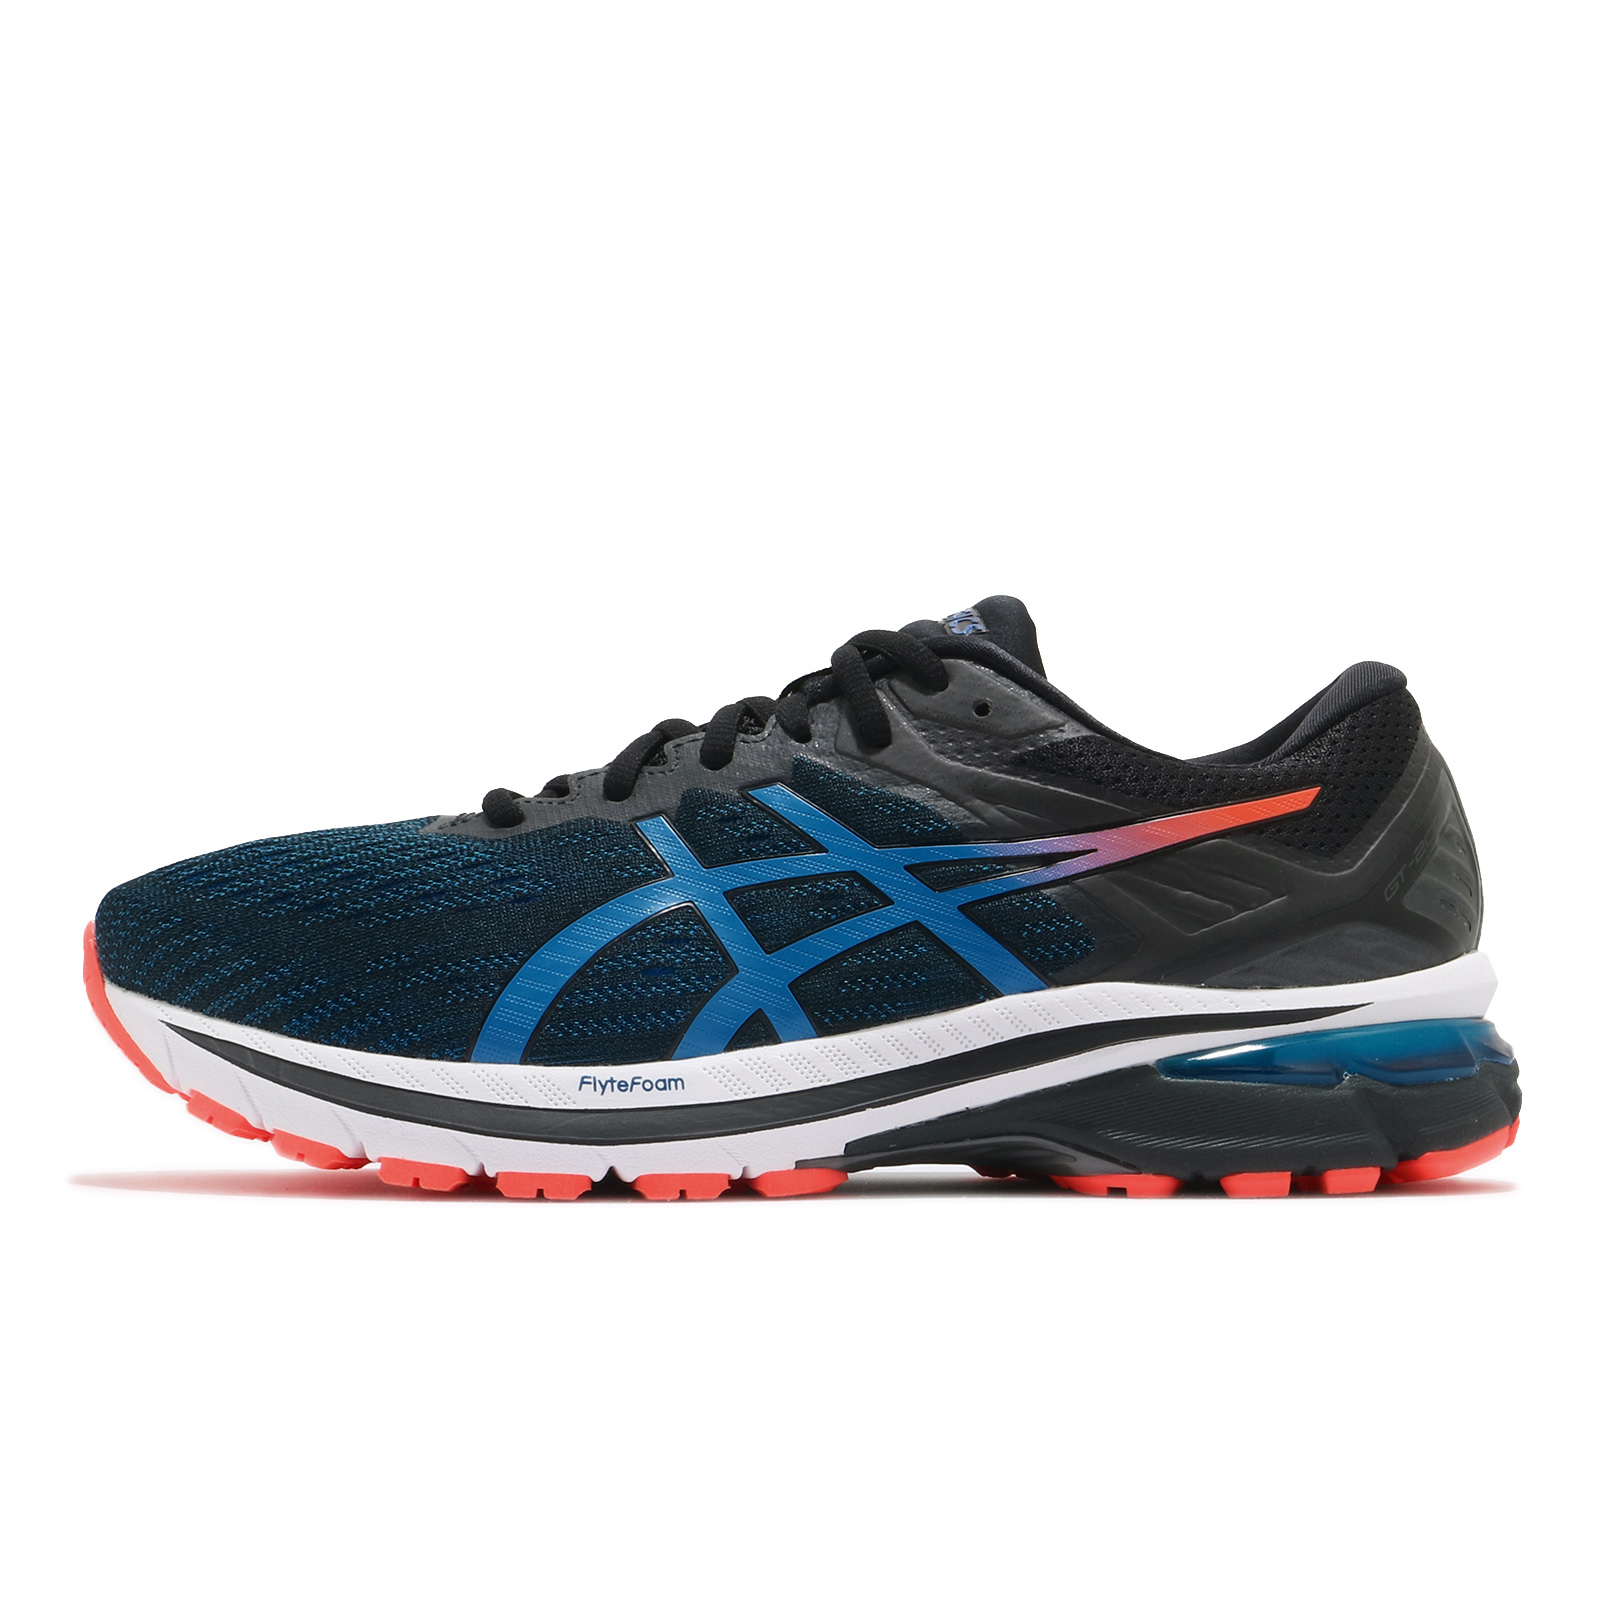 Asics 慢跑鞋 GT-2000 9 寬楦頭 男 藍 黑 橘 高支撐 路跑 運動鞋 【ACS】 1011A984003